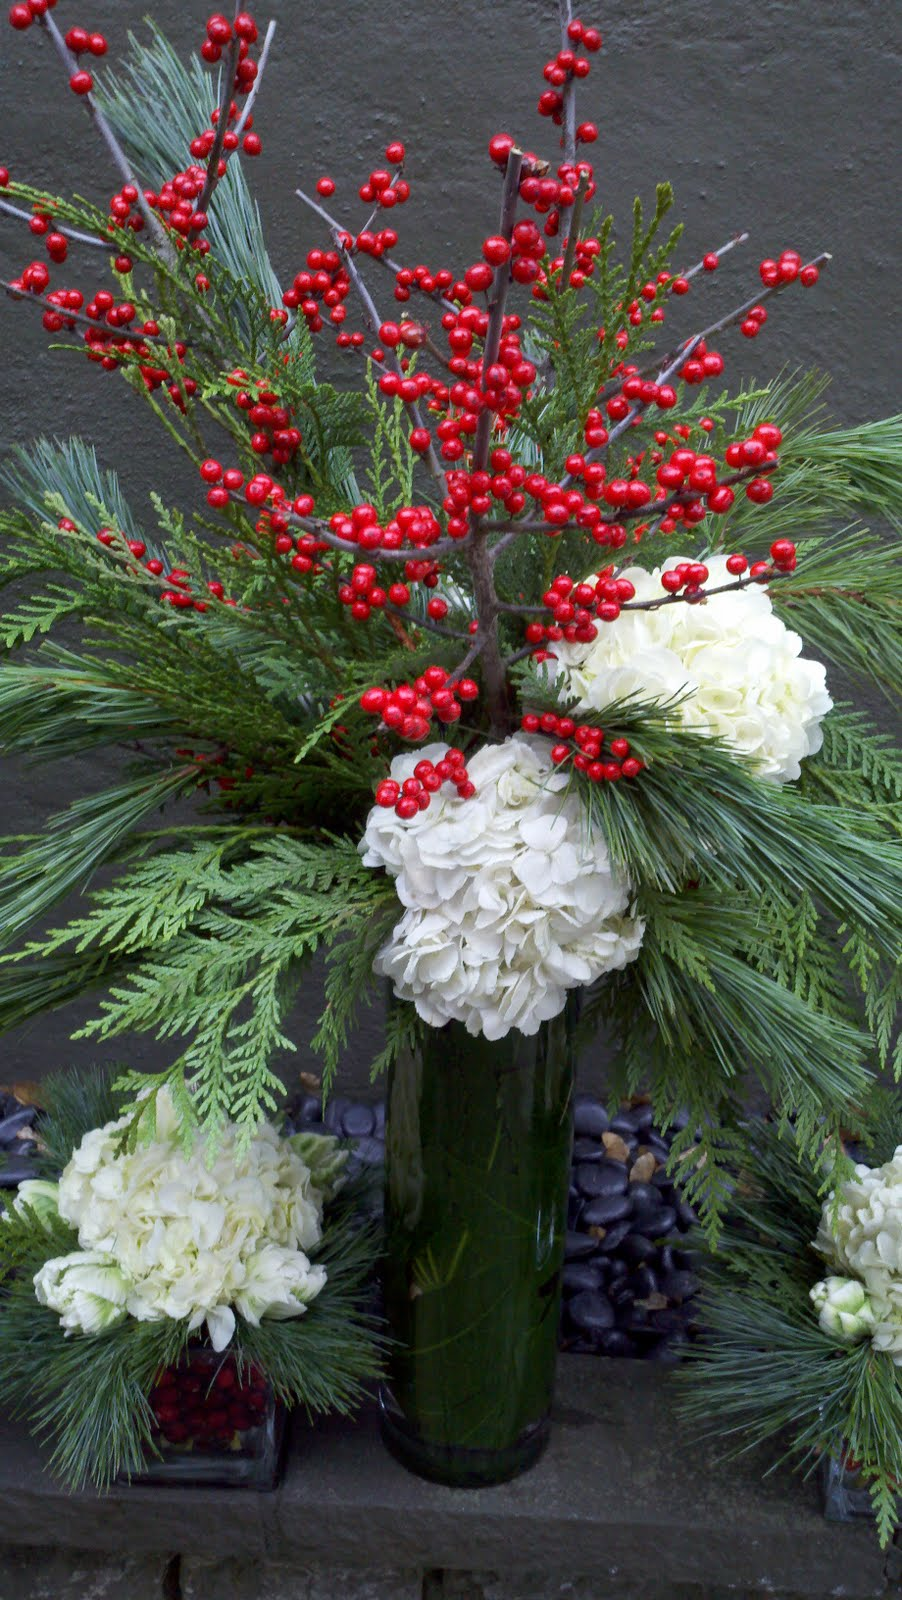 WINTER HOLIDAY FLORALS | Juniper Flowers